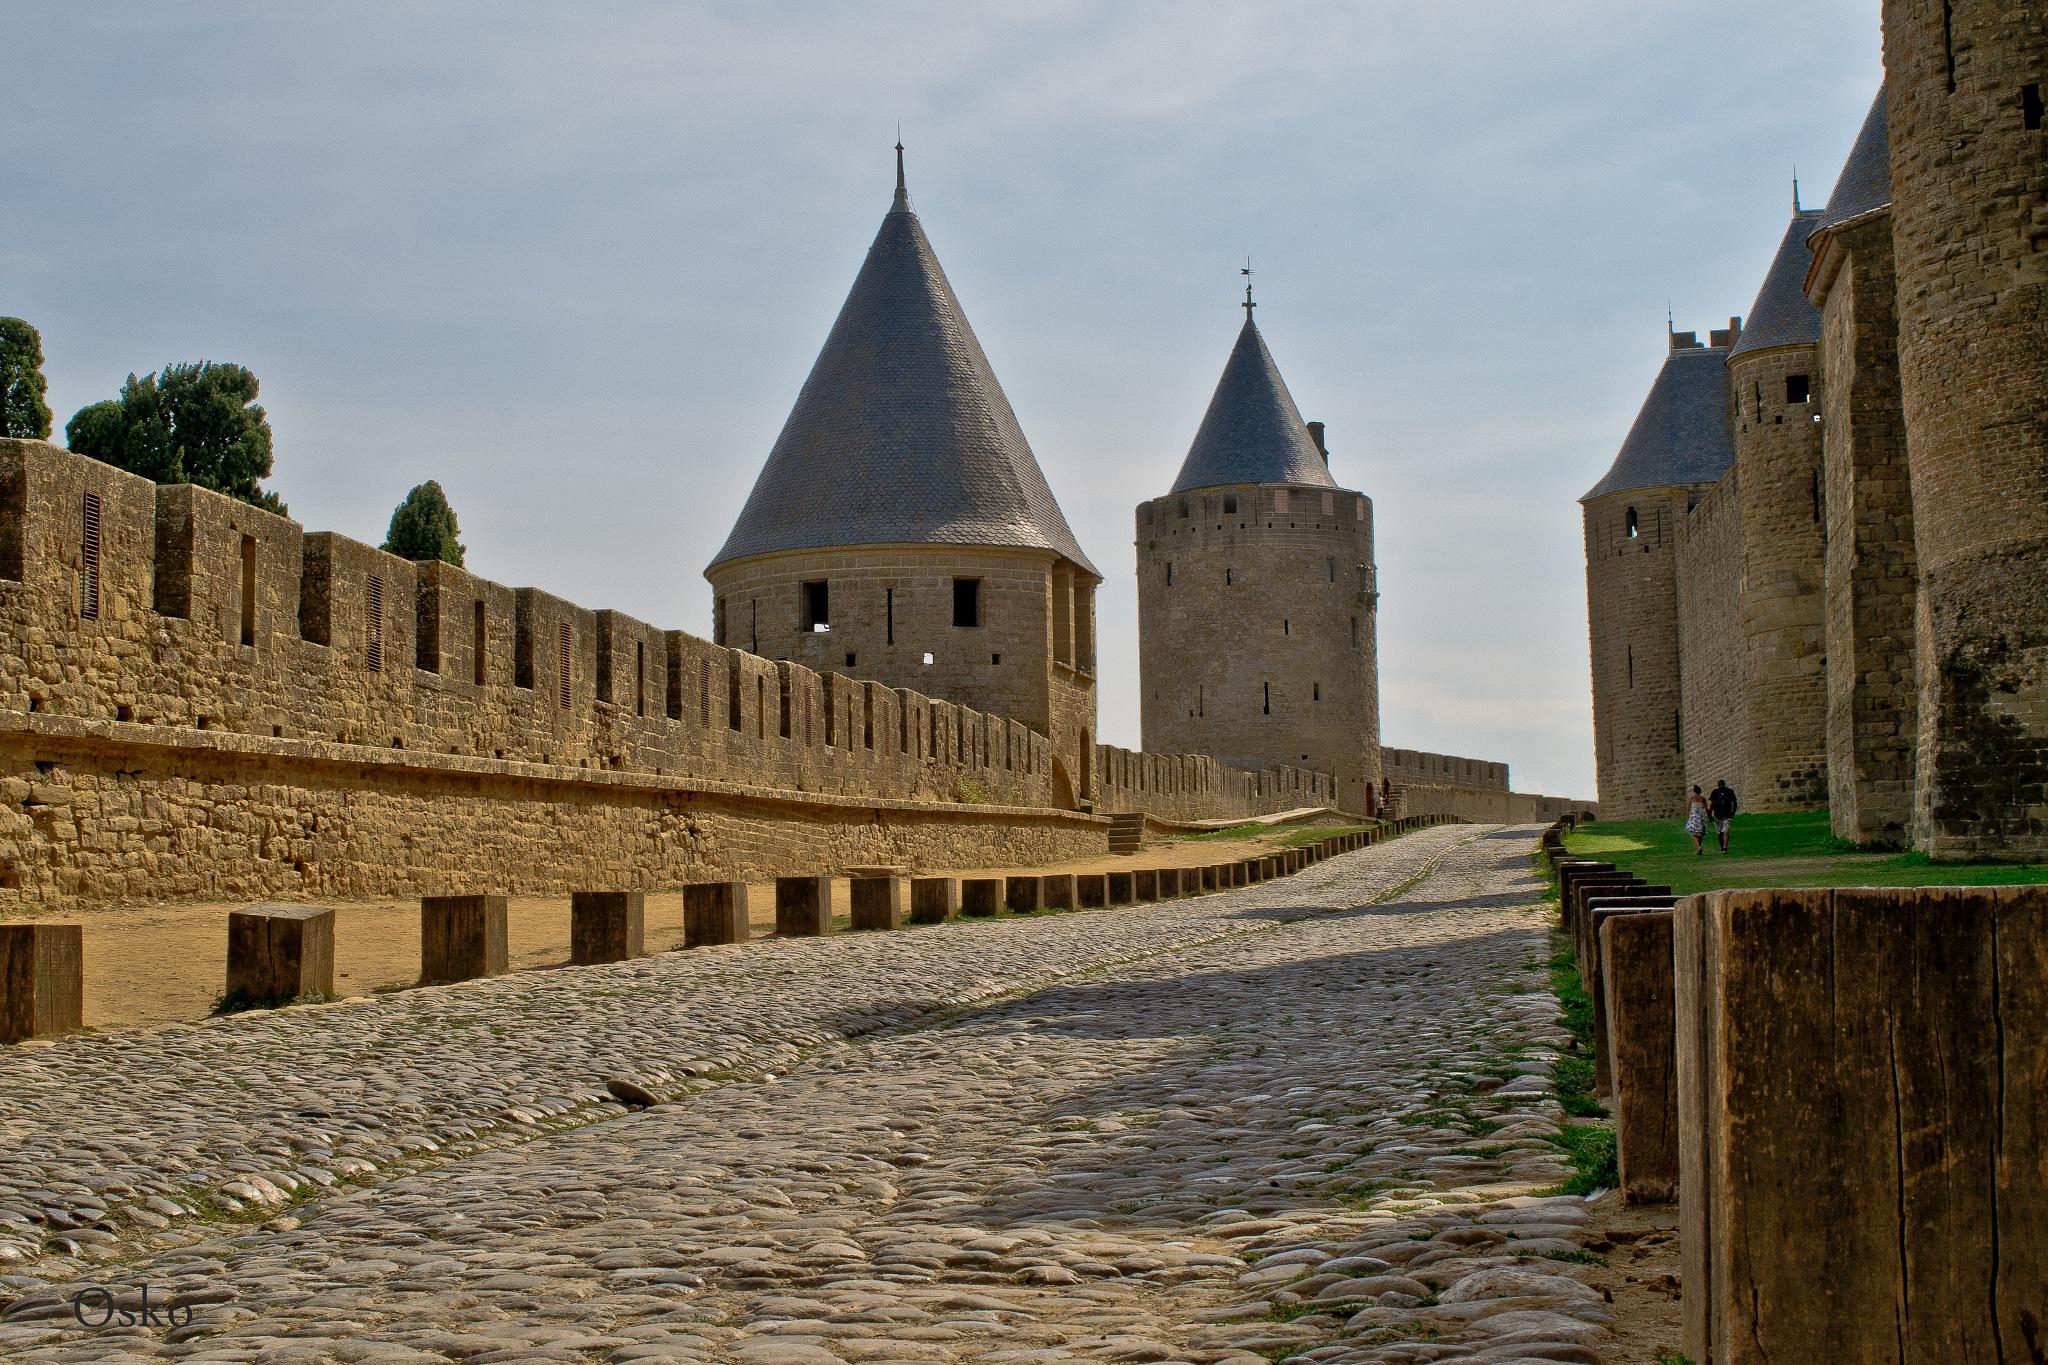 Entre las murallas de Carcassonne by oscarruben_suarez